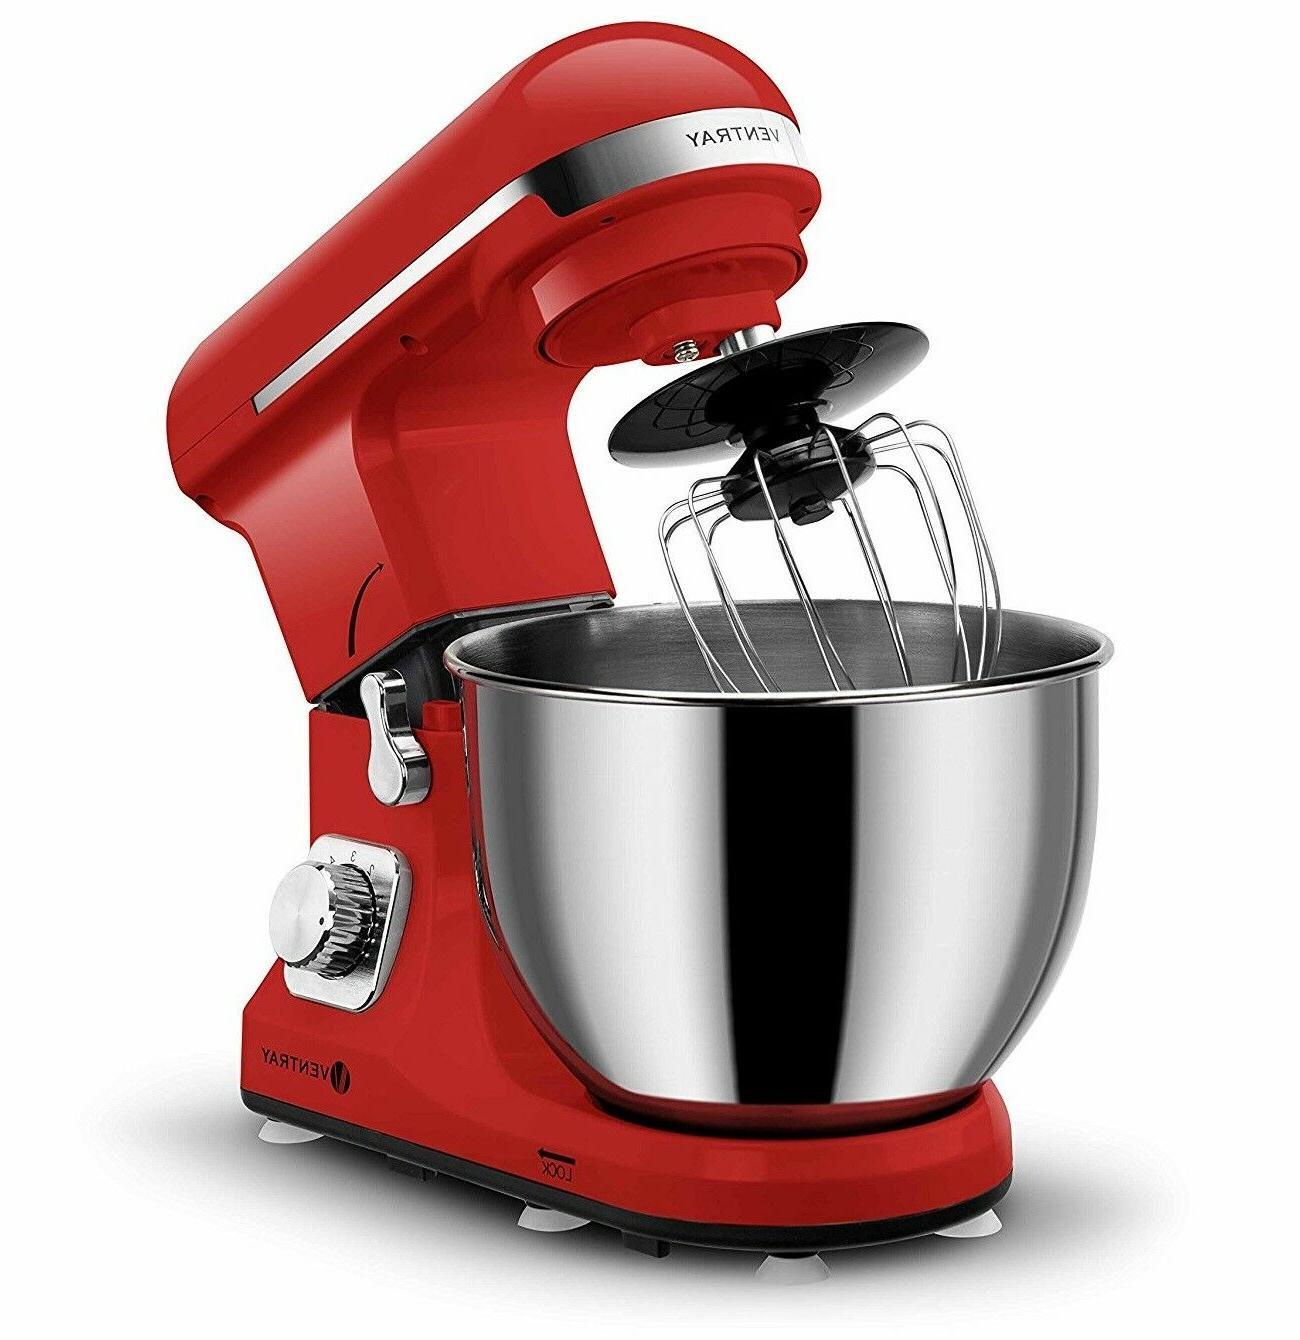 Whisk K5AWW /& Hook K5ADH New Kitchenaid Mixer 5QT Bowl Lift Tools Beater K5AB